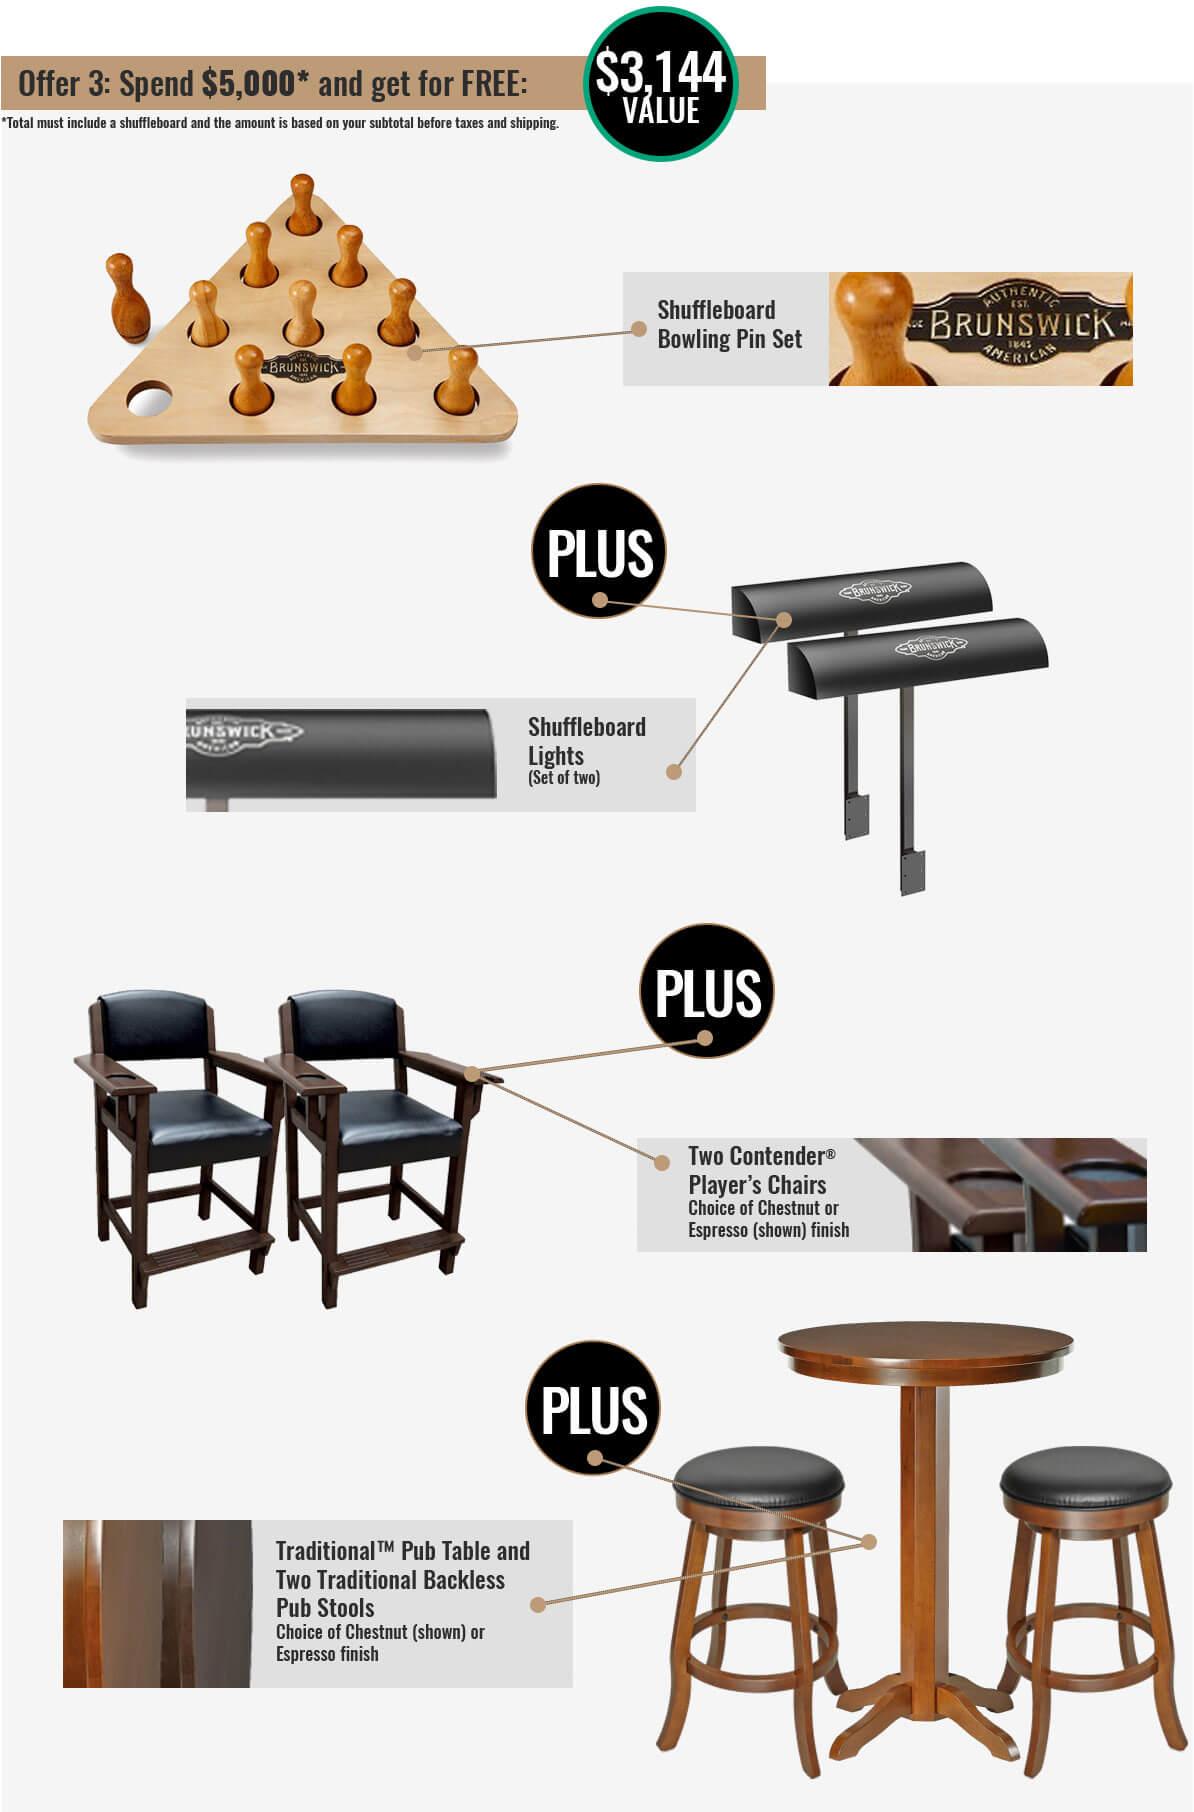 Brunswick Shuffleboard Promotion 3 at Best Quality Billiards